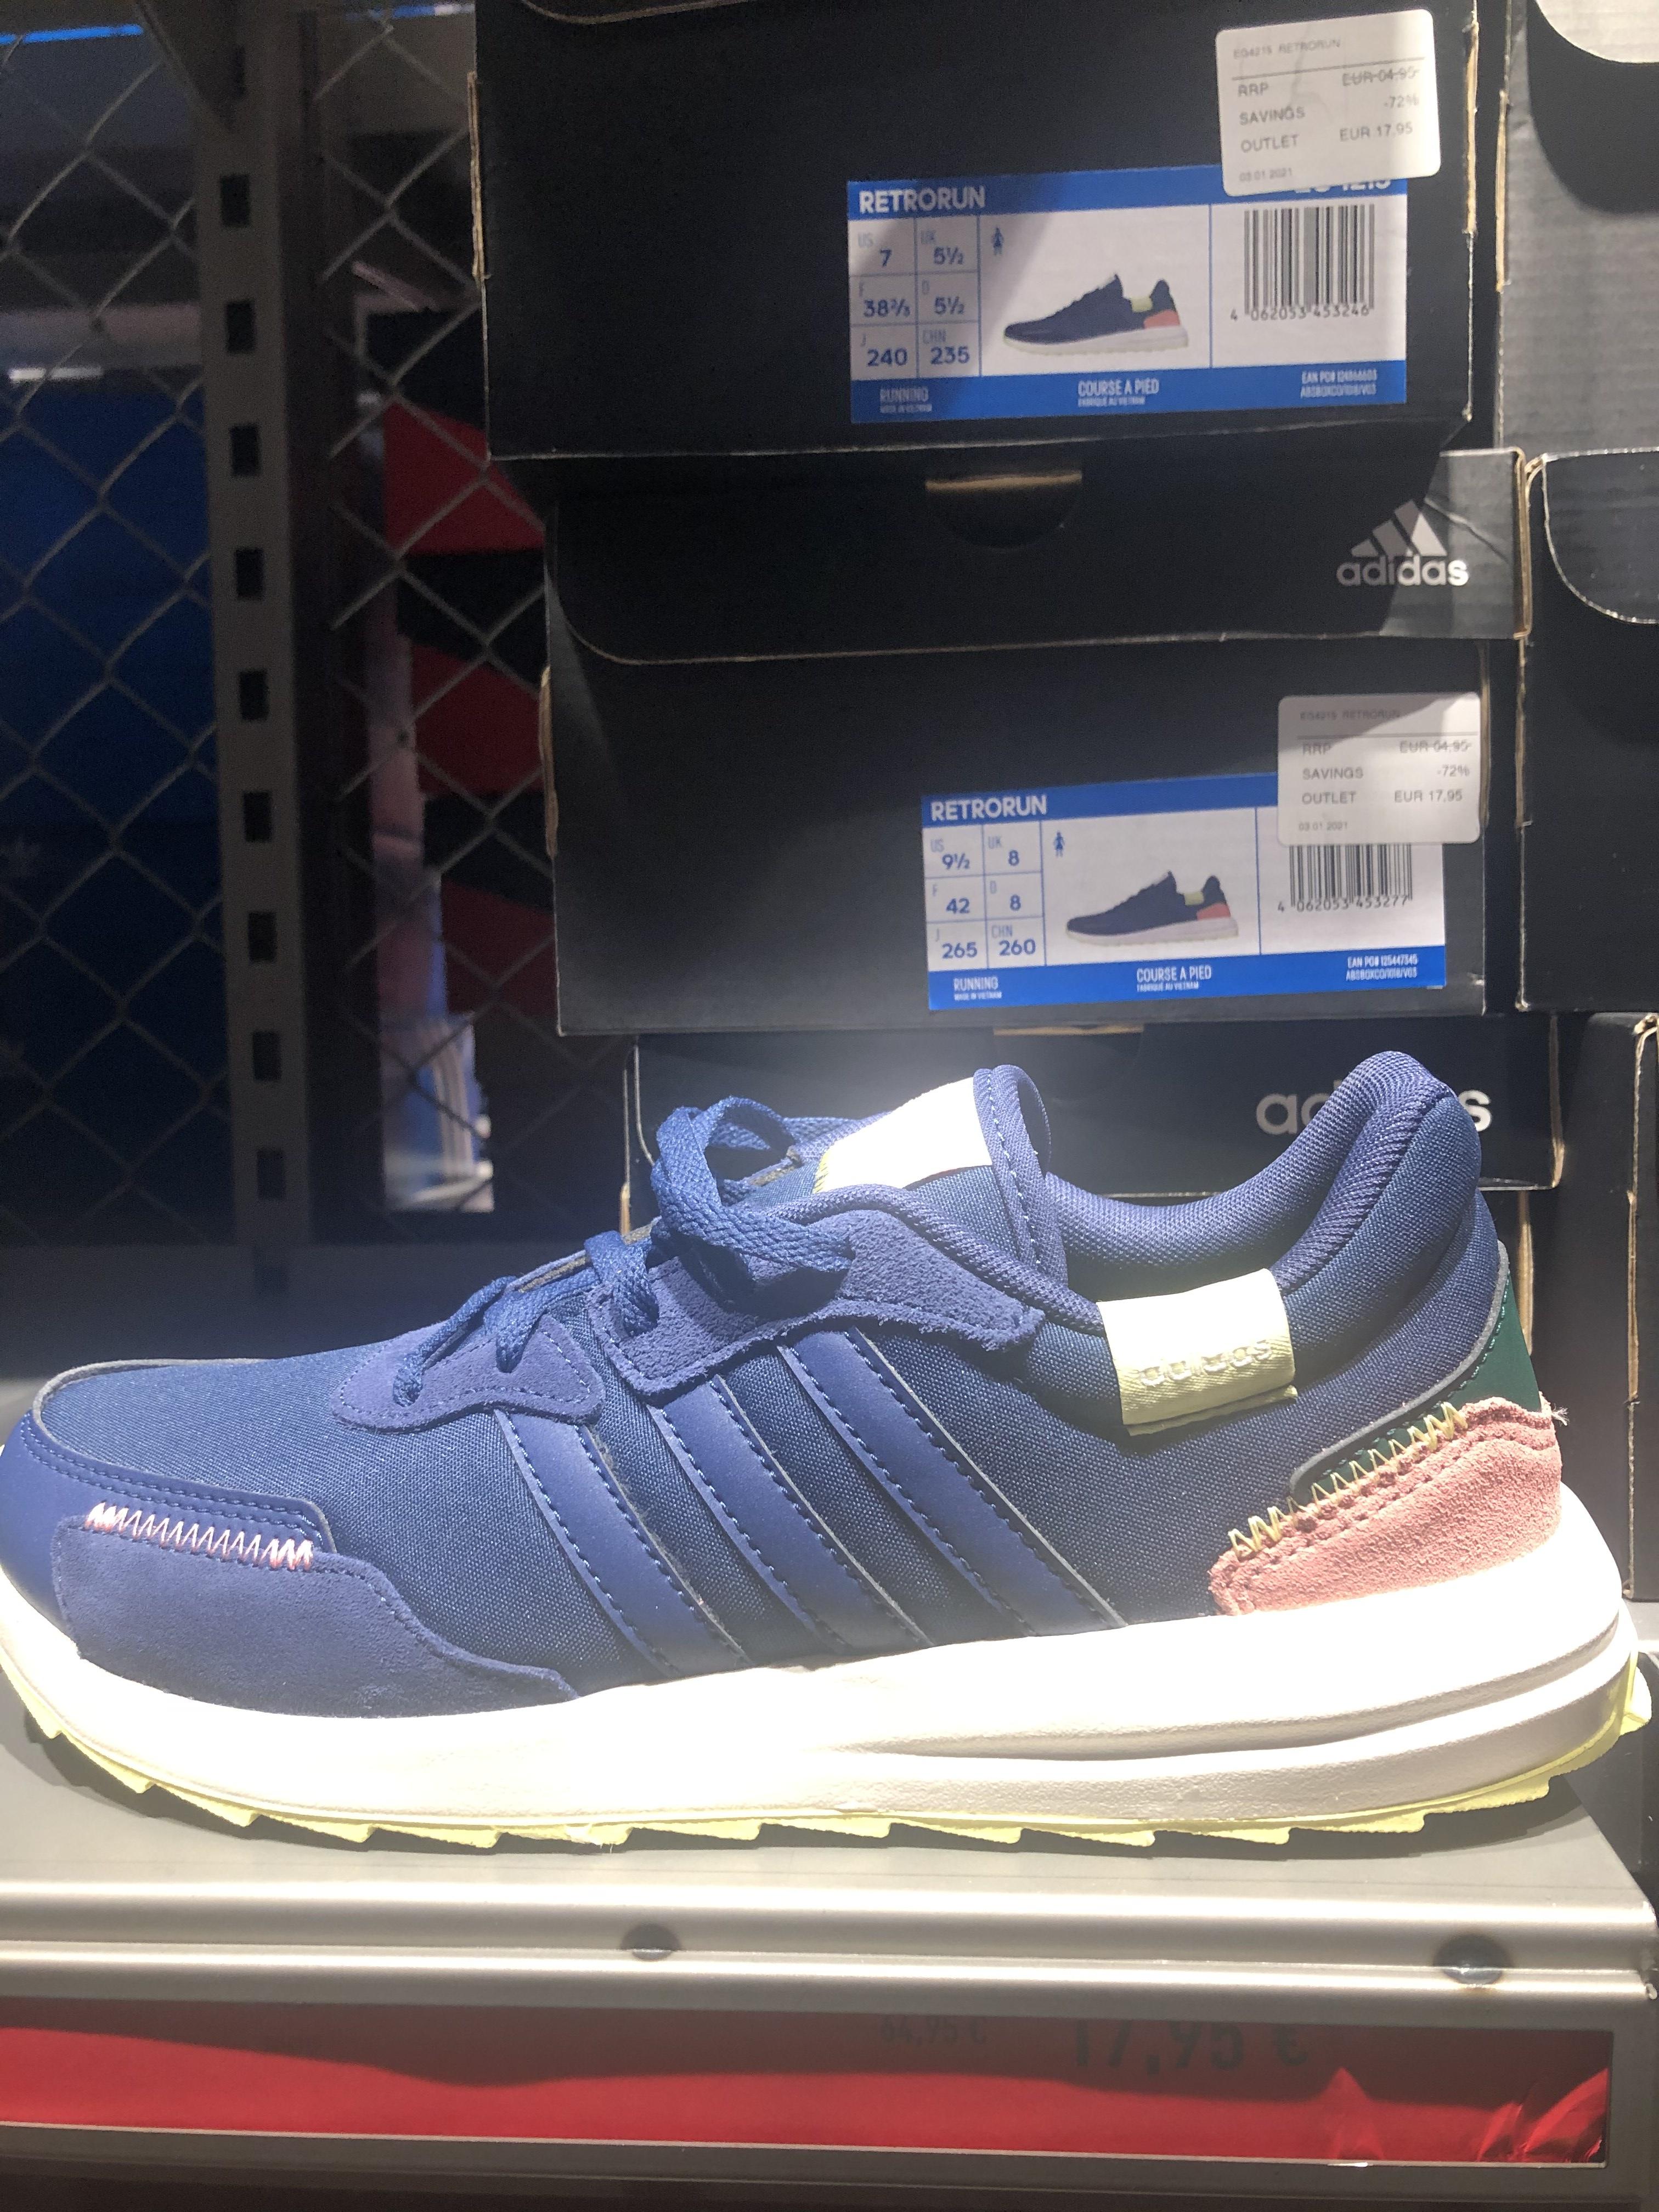 Adidas Retrorun (Outlet Nassica - Getafe)